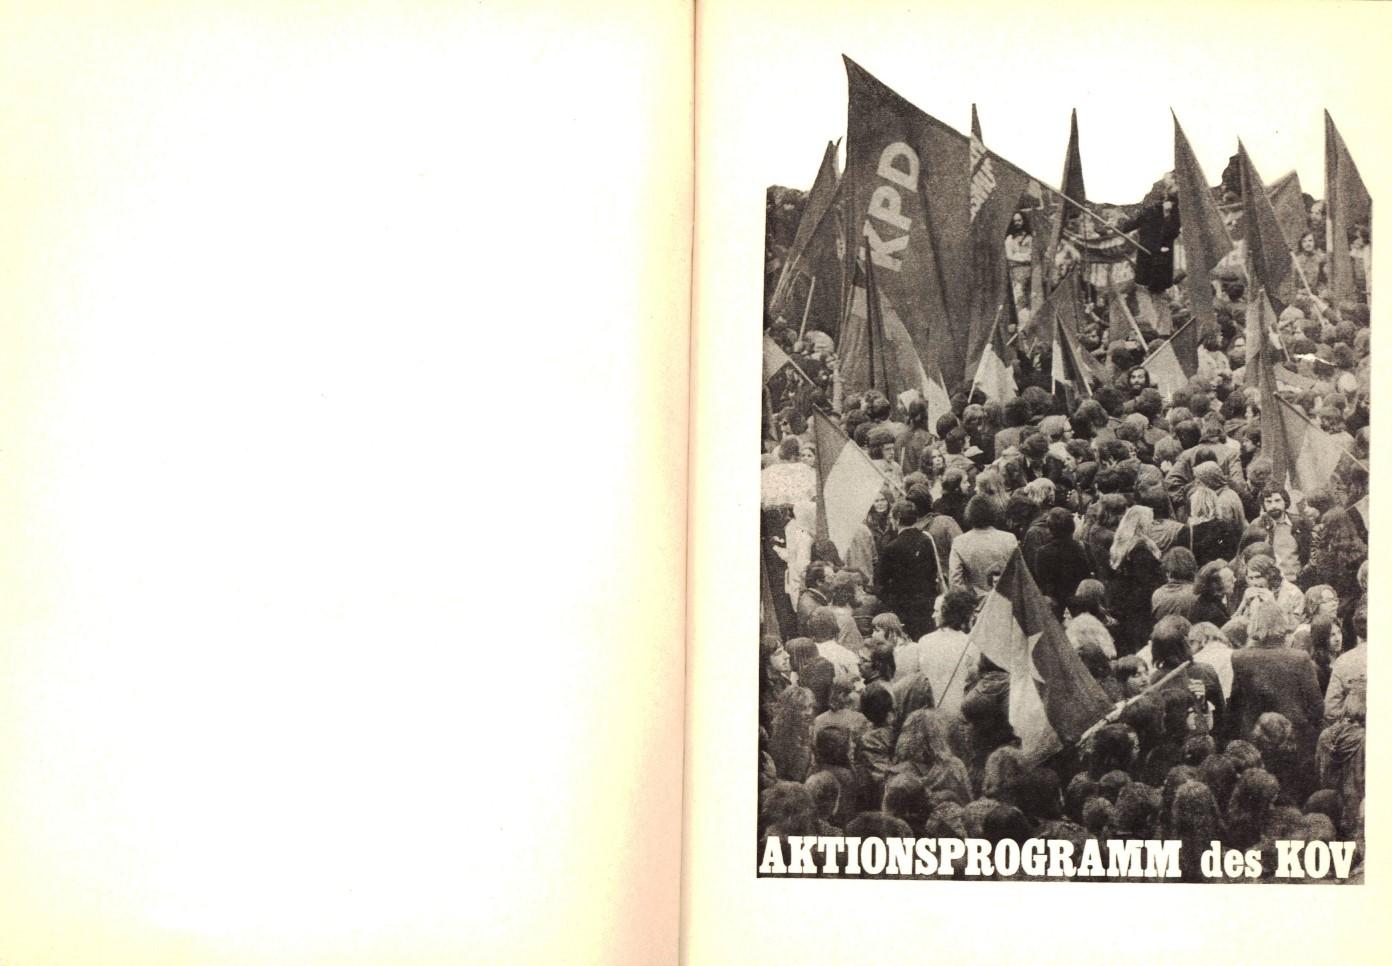 KOV_1973_Aktionsprogramm_03